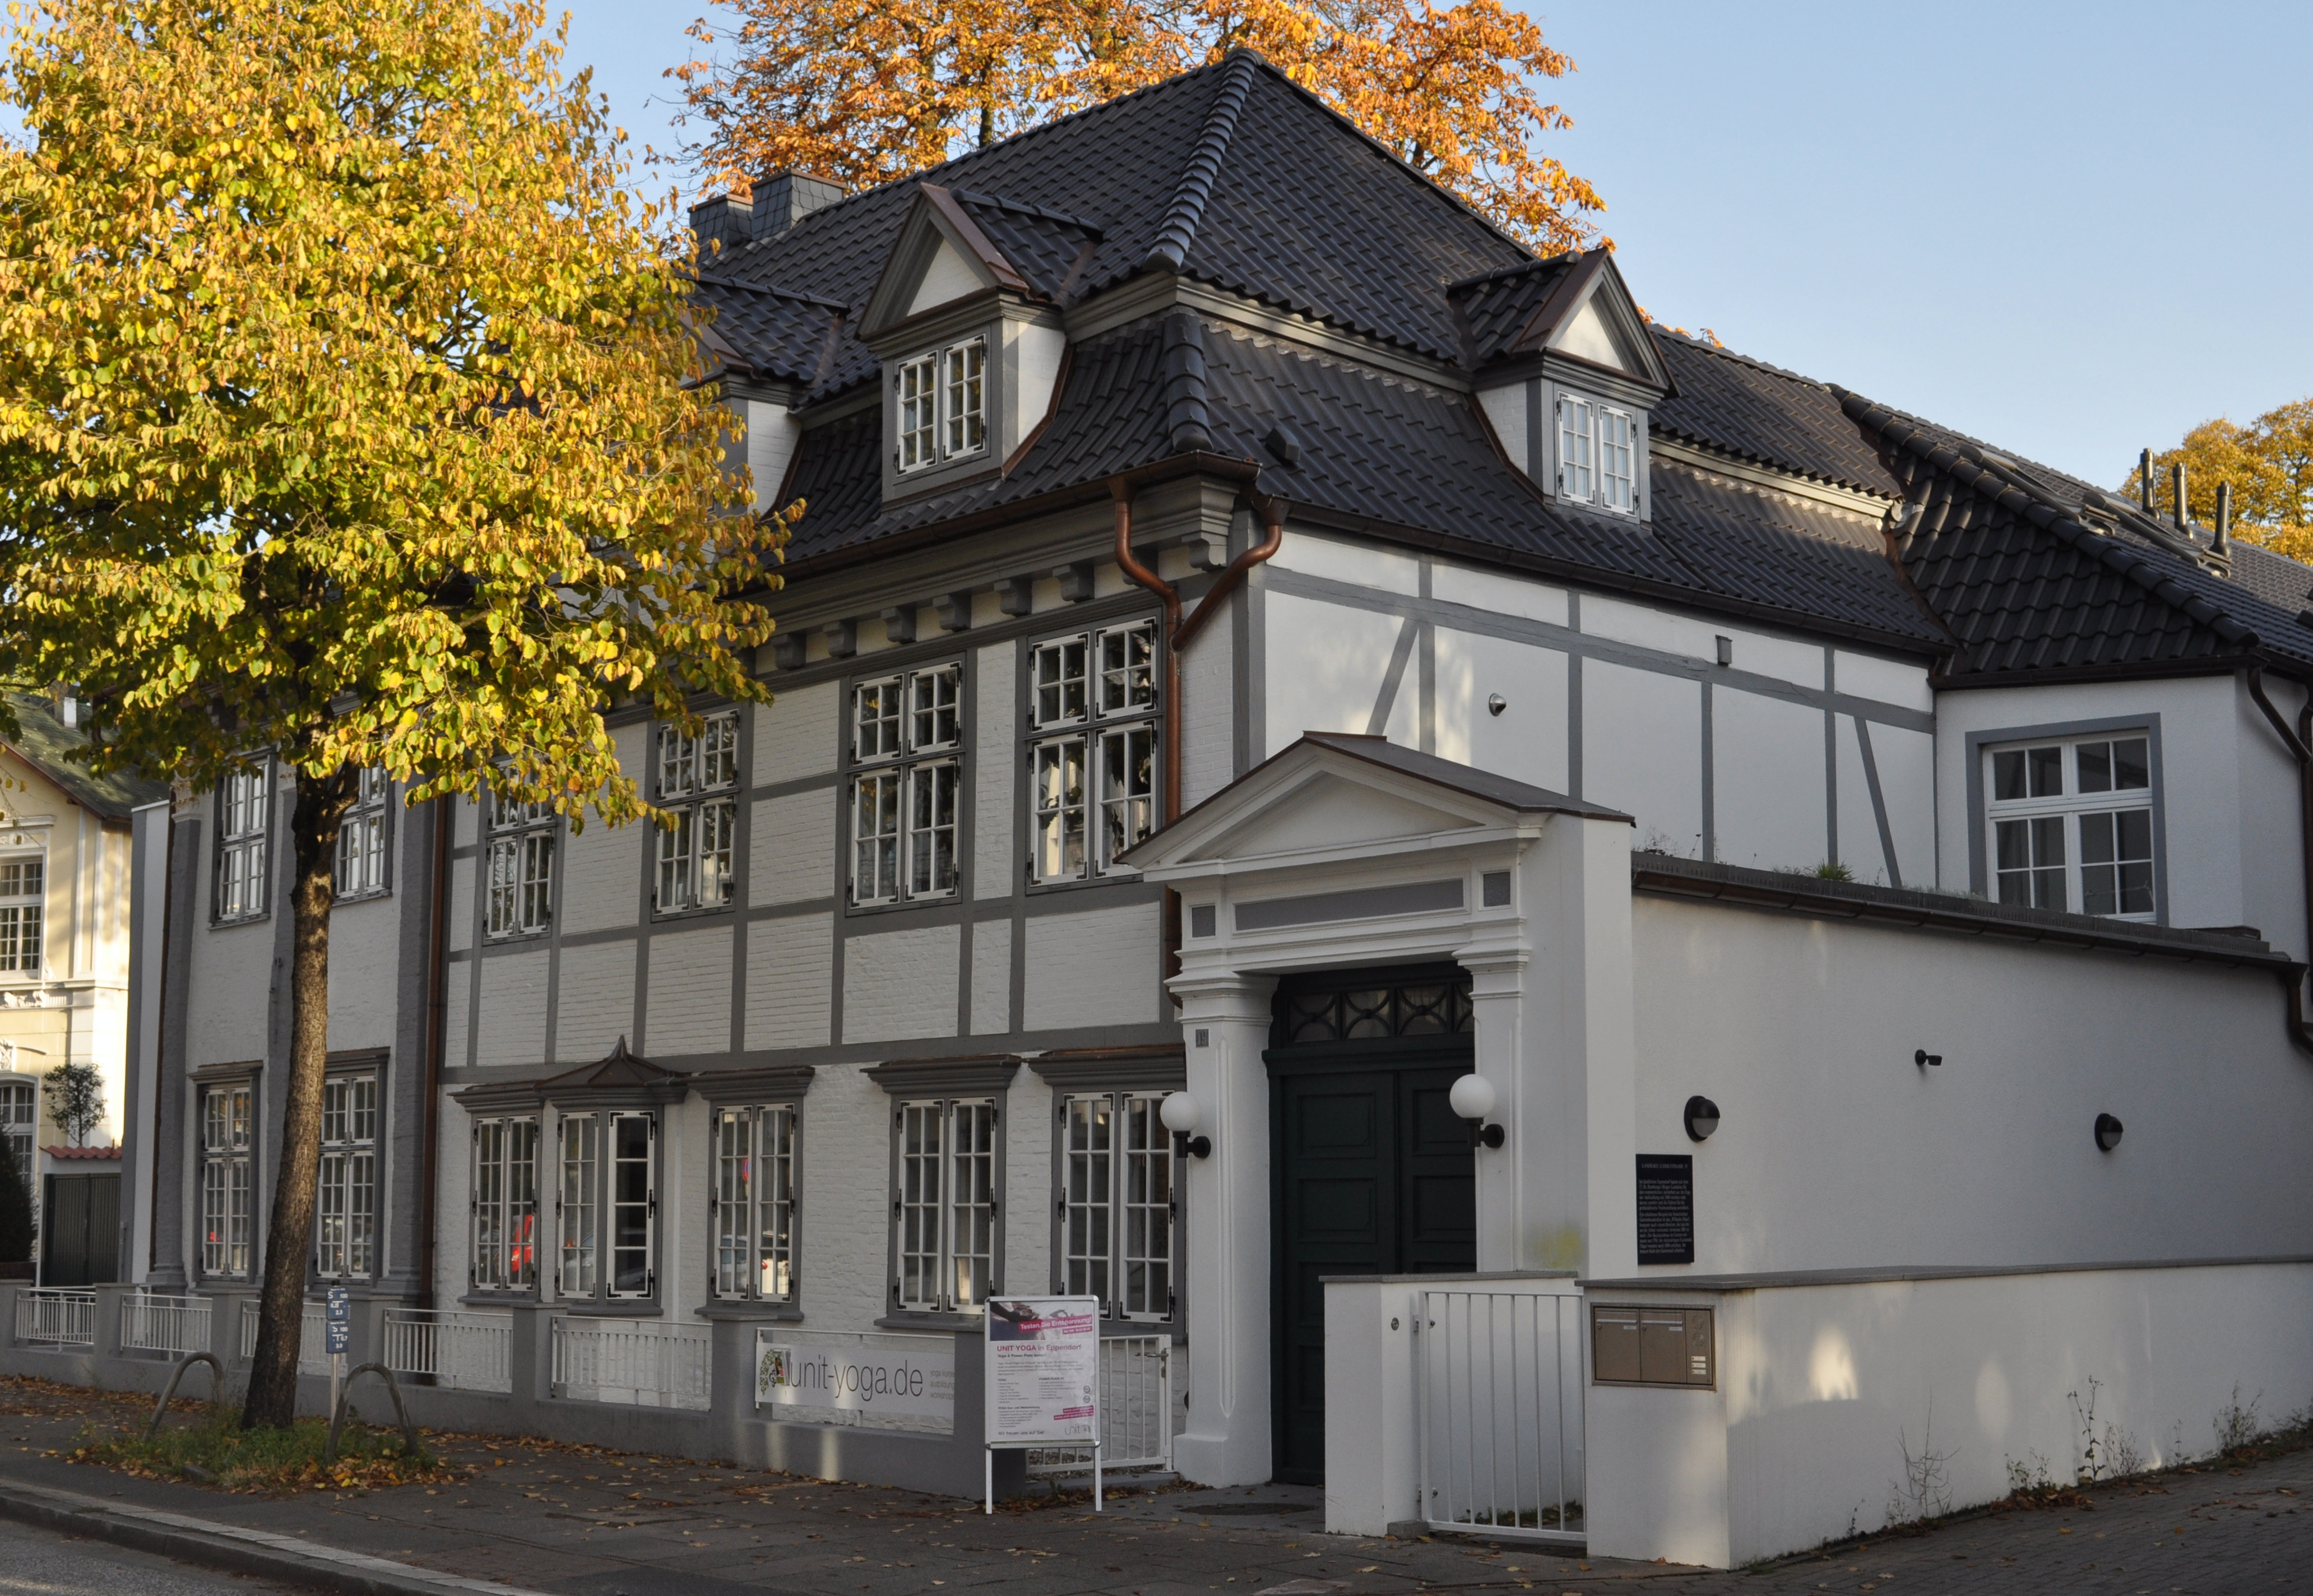 FileLudolfstraße 19 (HamburgEppendorf)1ajbjpg